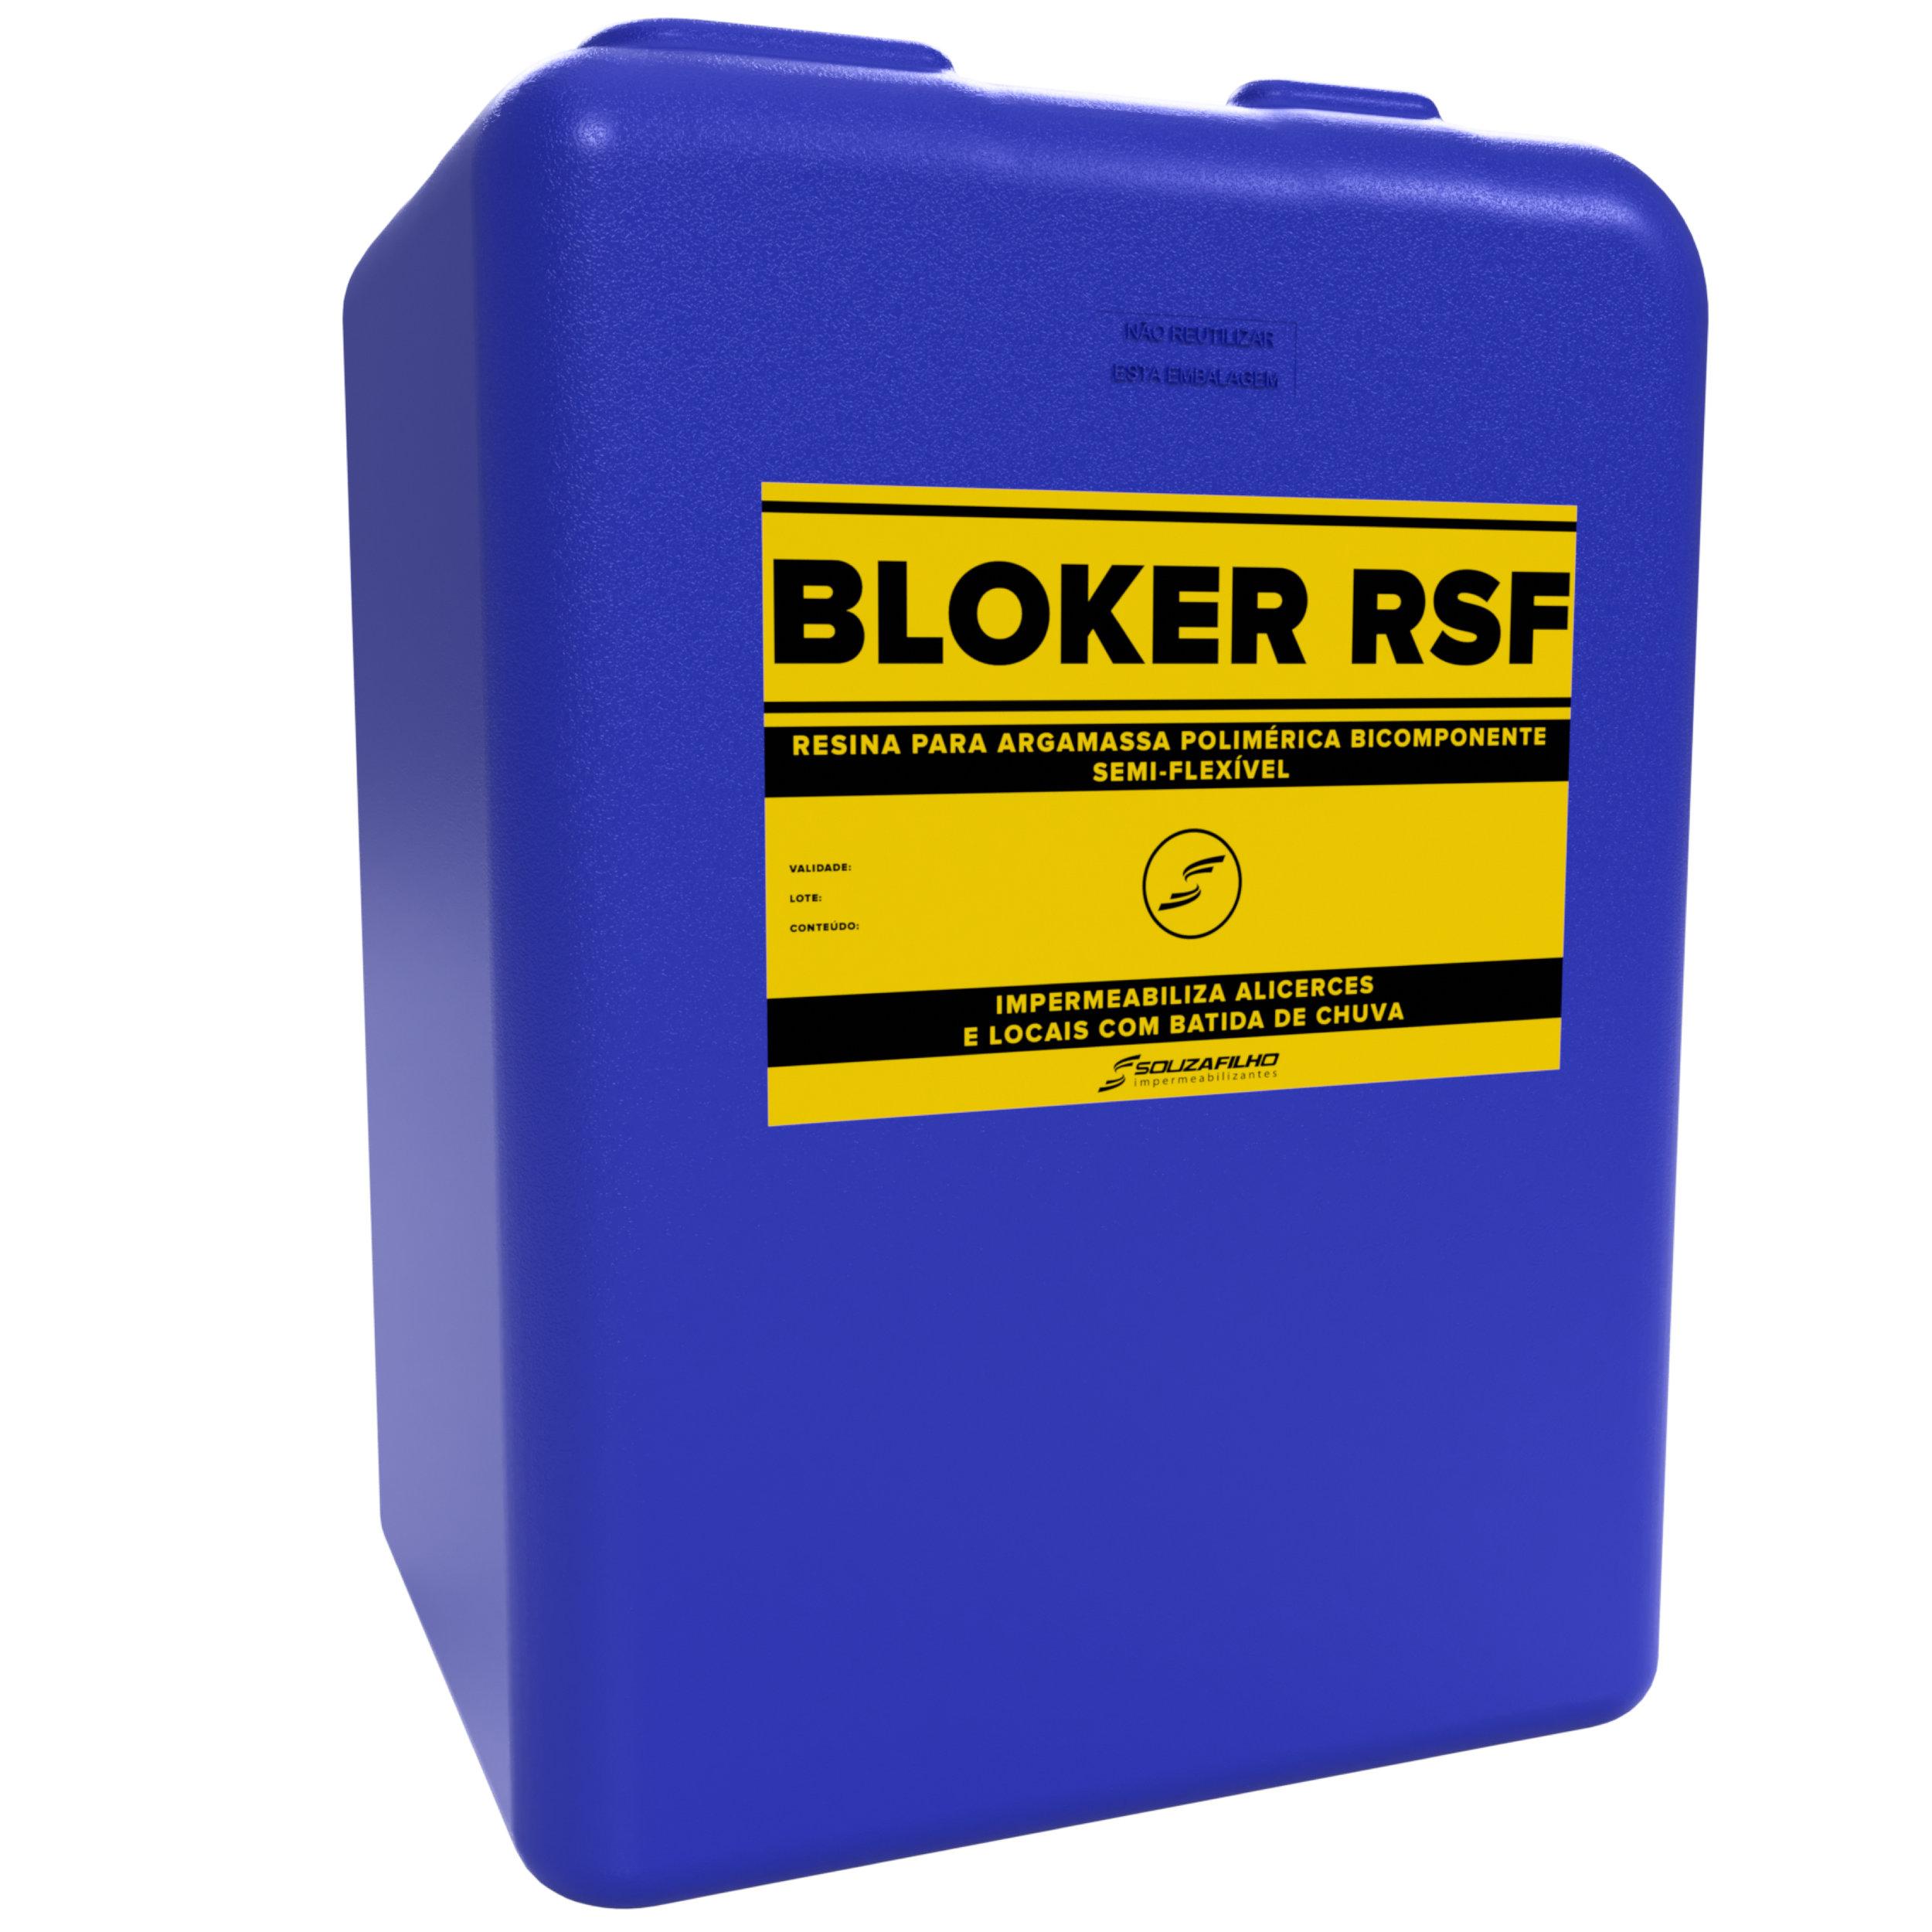 bloker rsf argamassa polimerica impermeabilizante semi flexivel.jpg